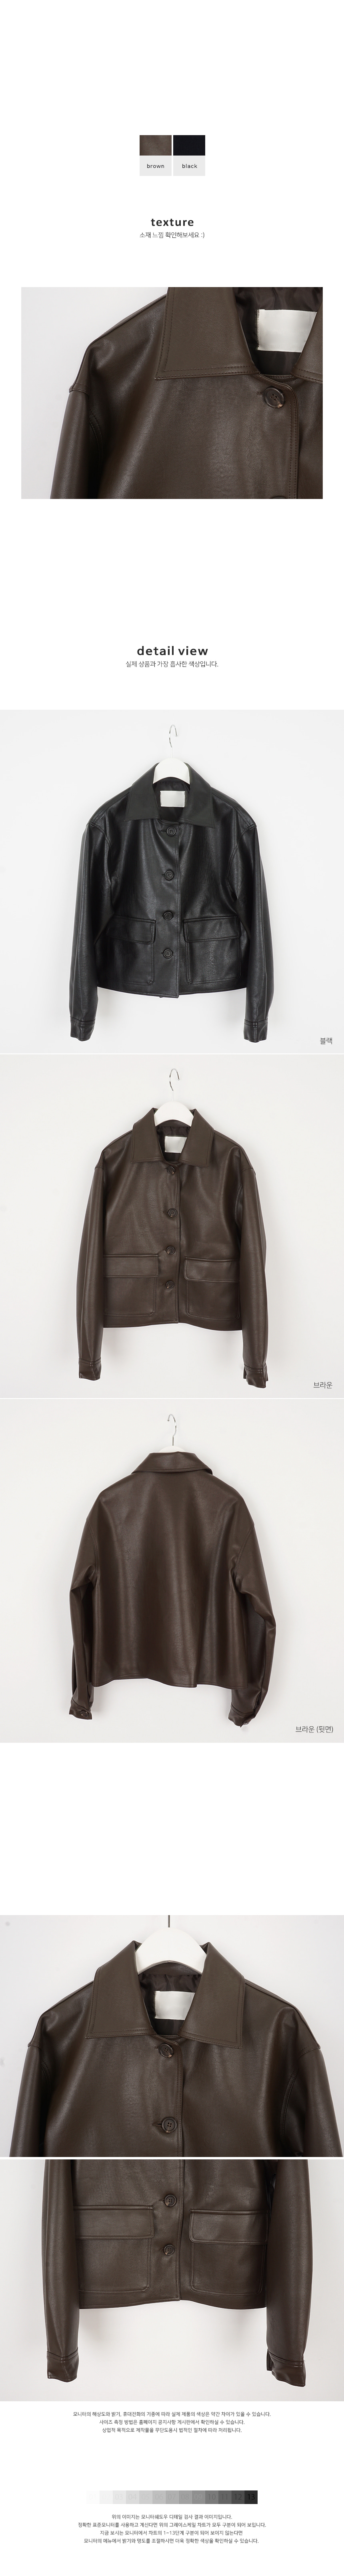 Cosmic Leather Jacket